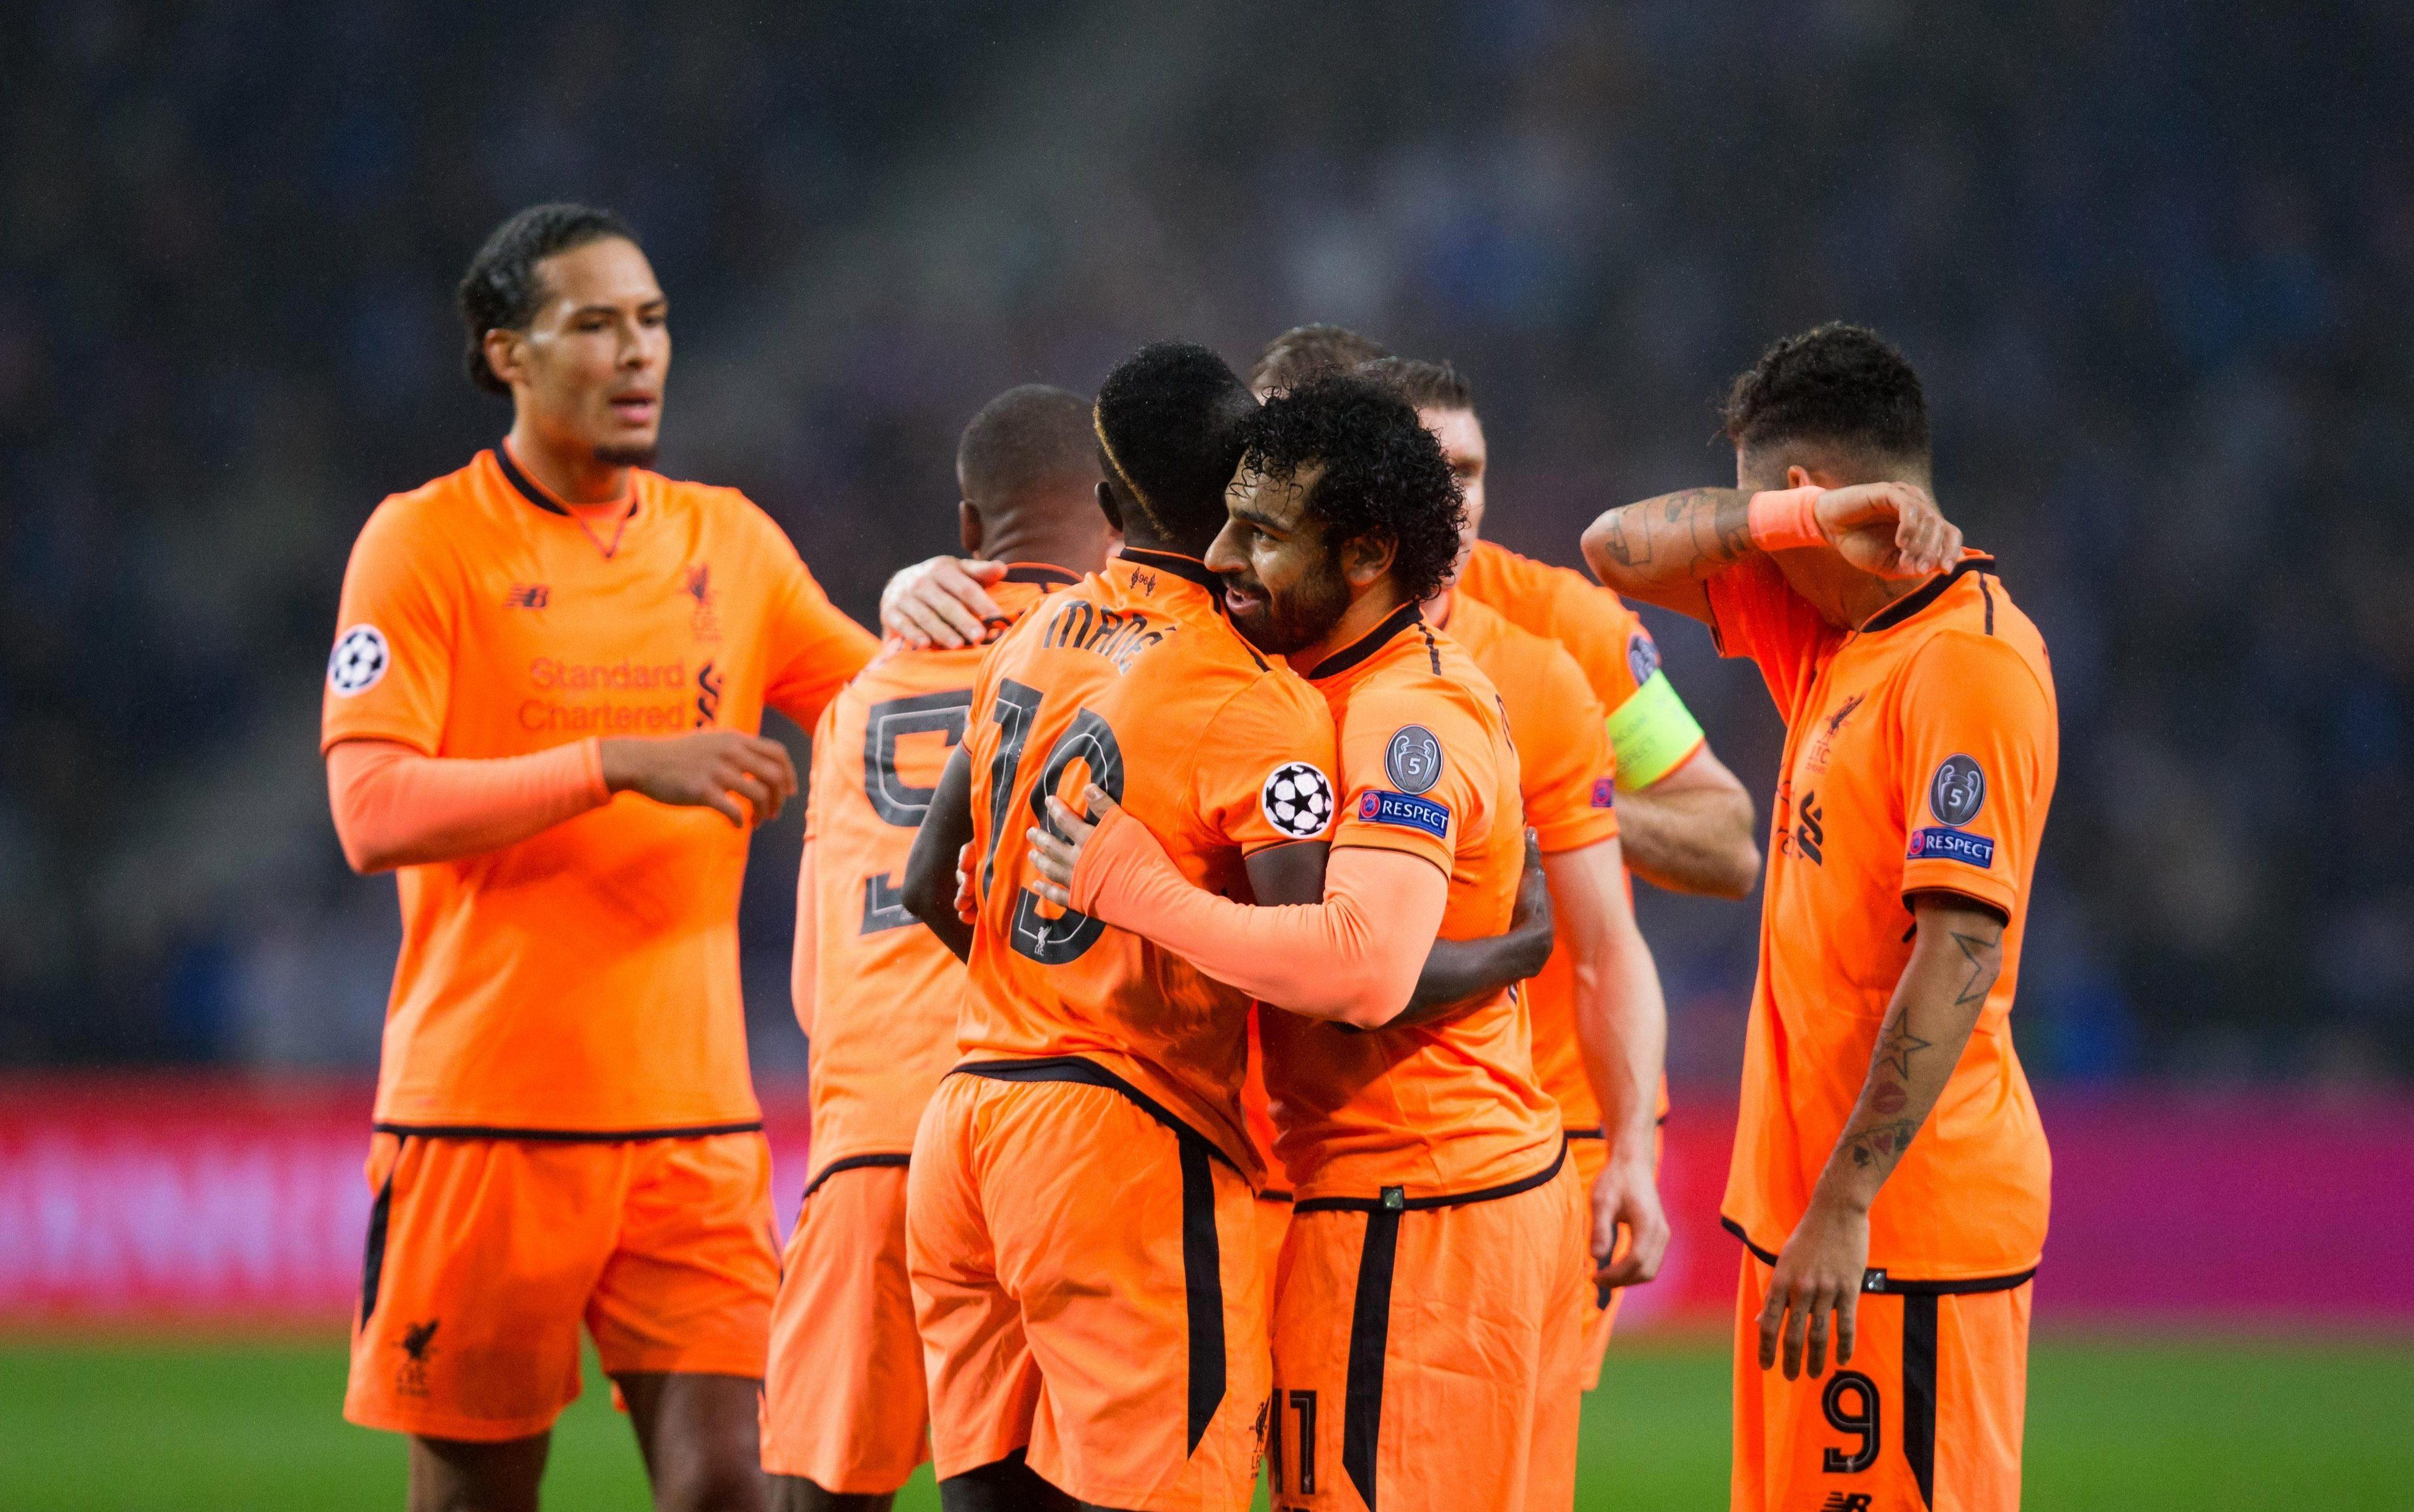 Liverpool ripped Porto to shreds